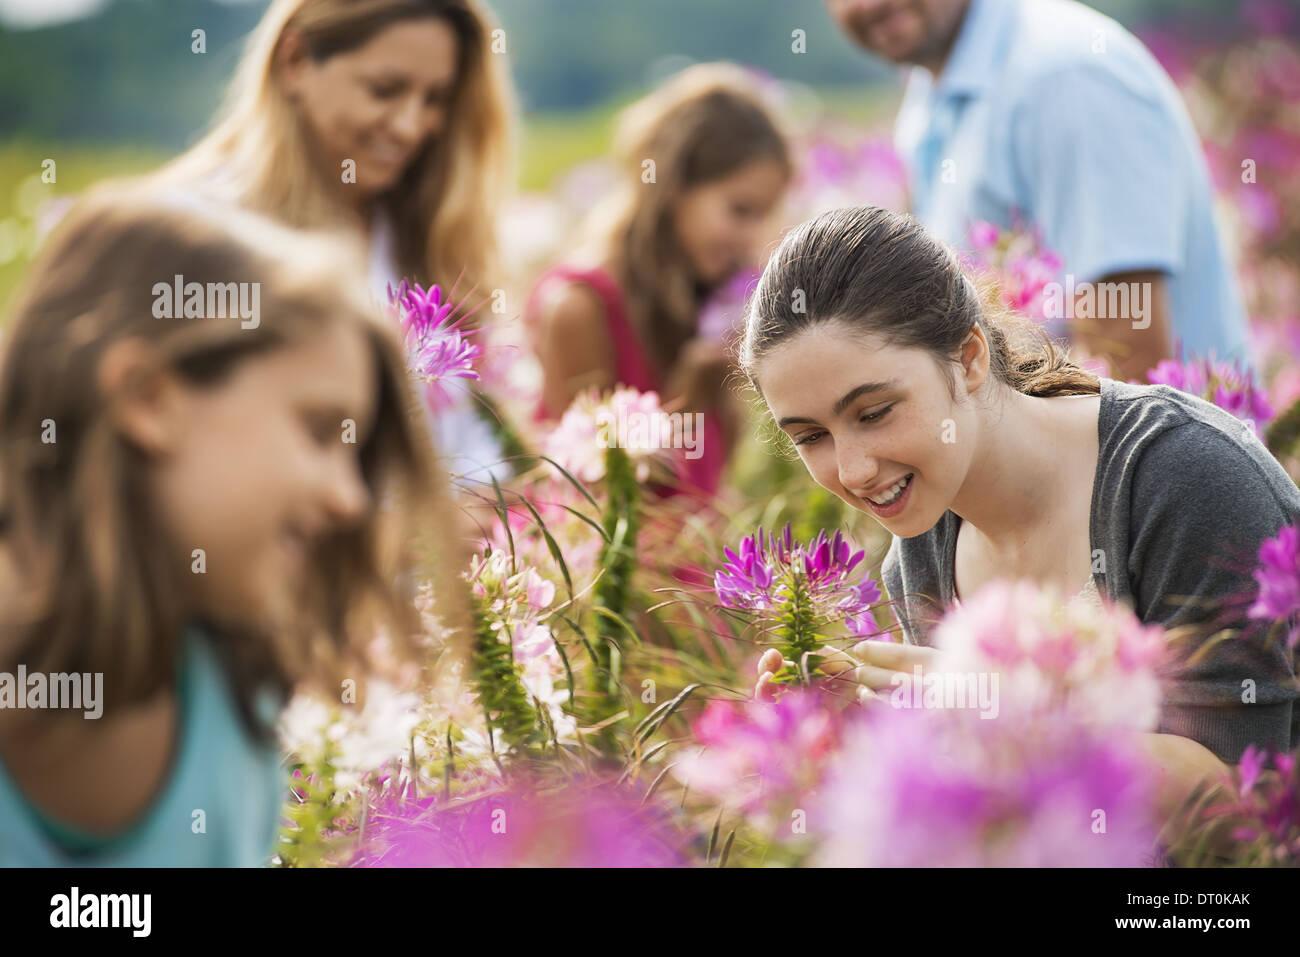 Woodstock New York USA Five people among the flowers organic Flower Farm - Stock Image